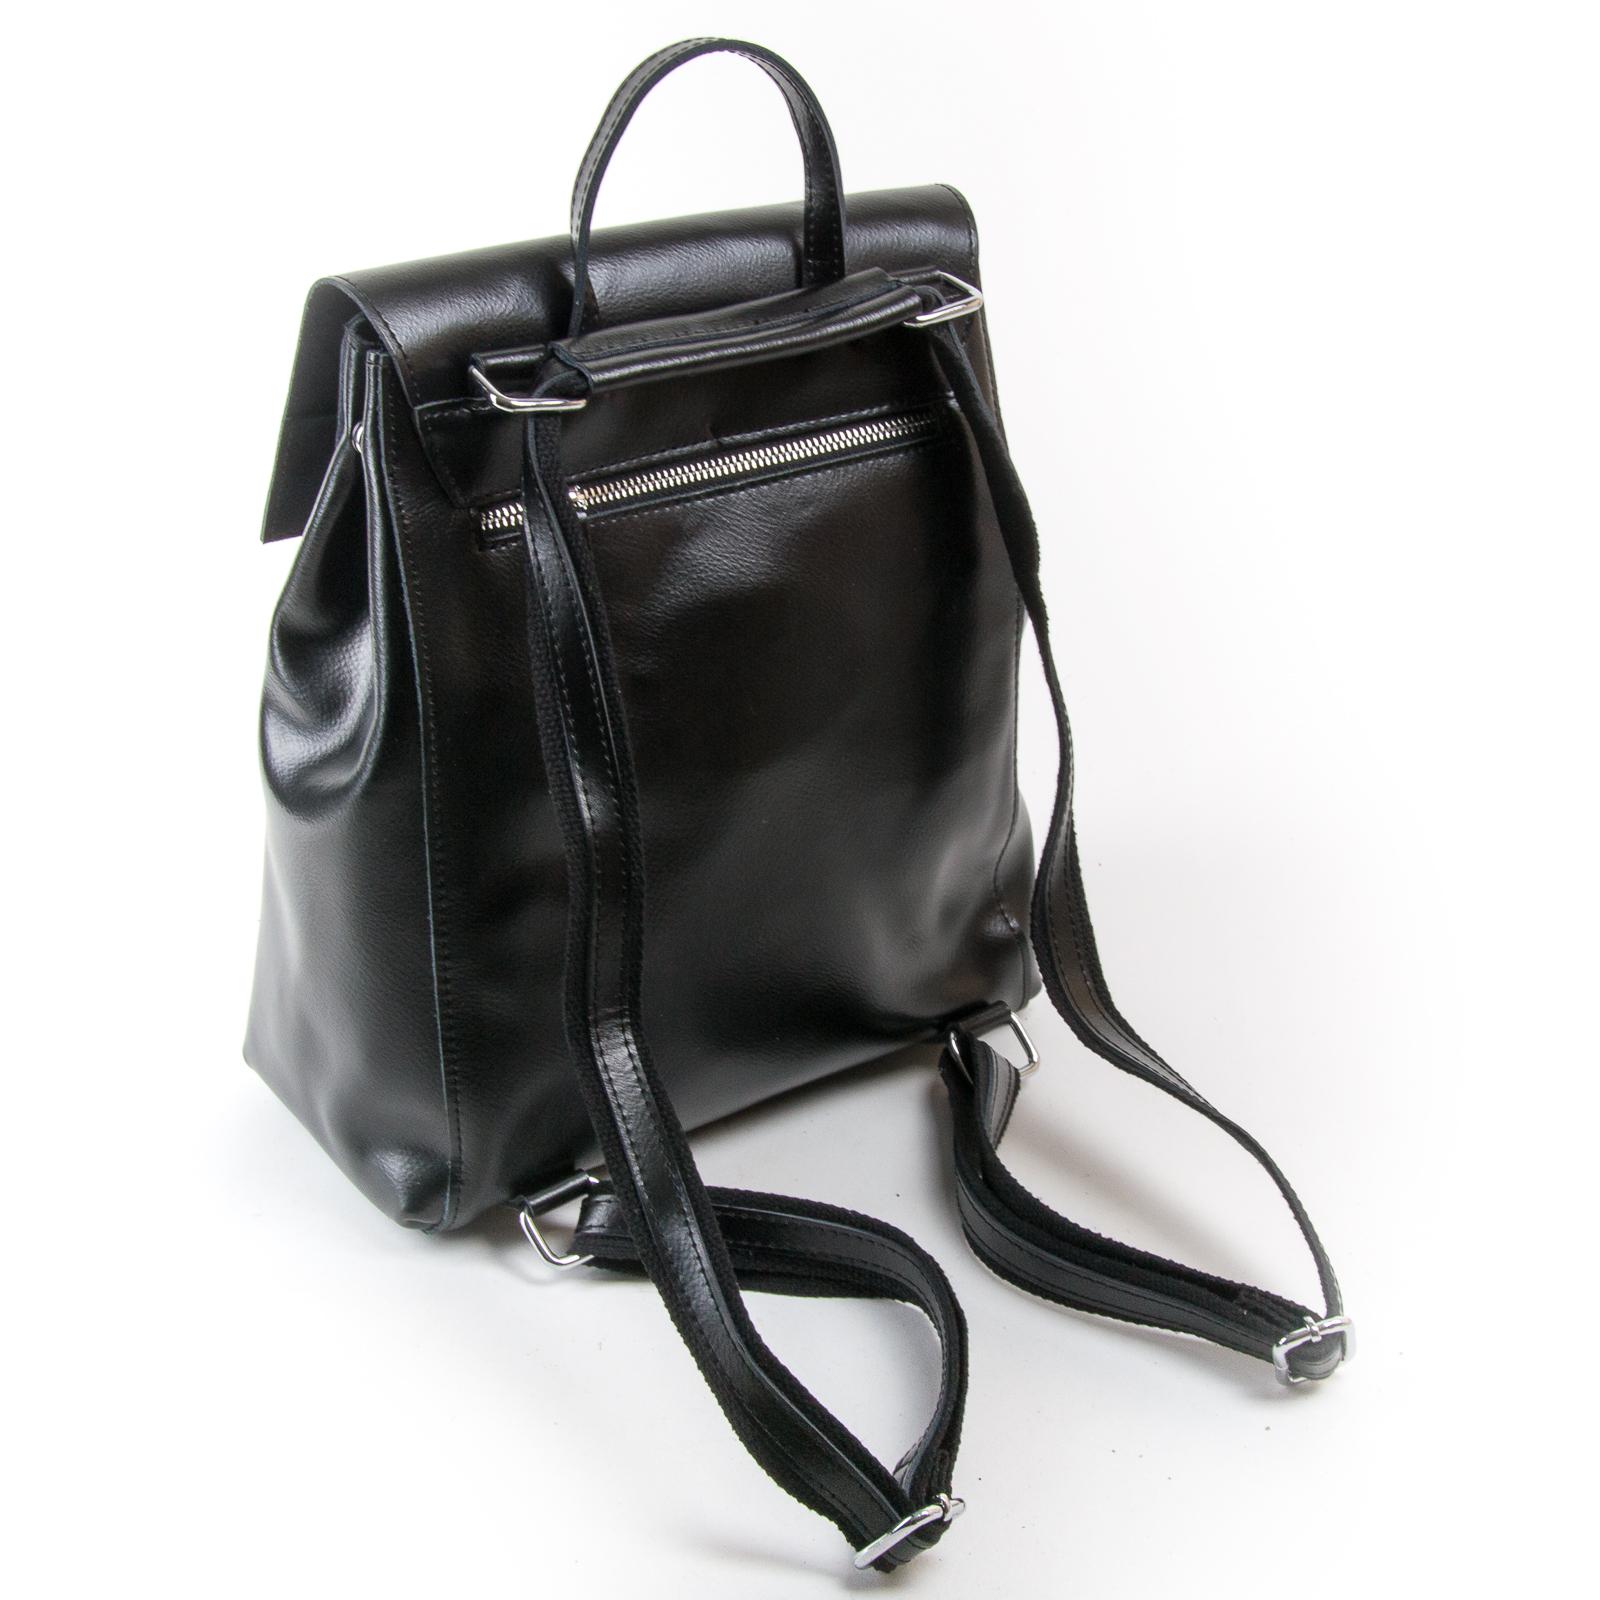 Сумка Женская Рюкзак кожа ALEX RAI 03-01 373 black - фото 4